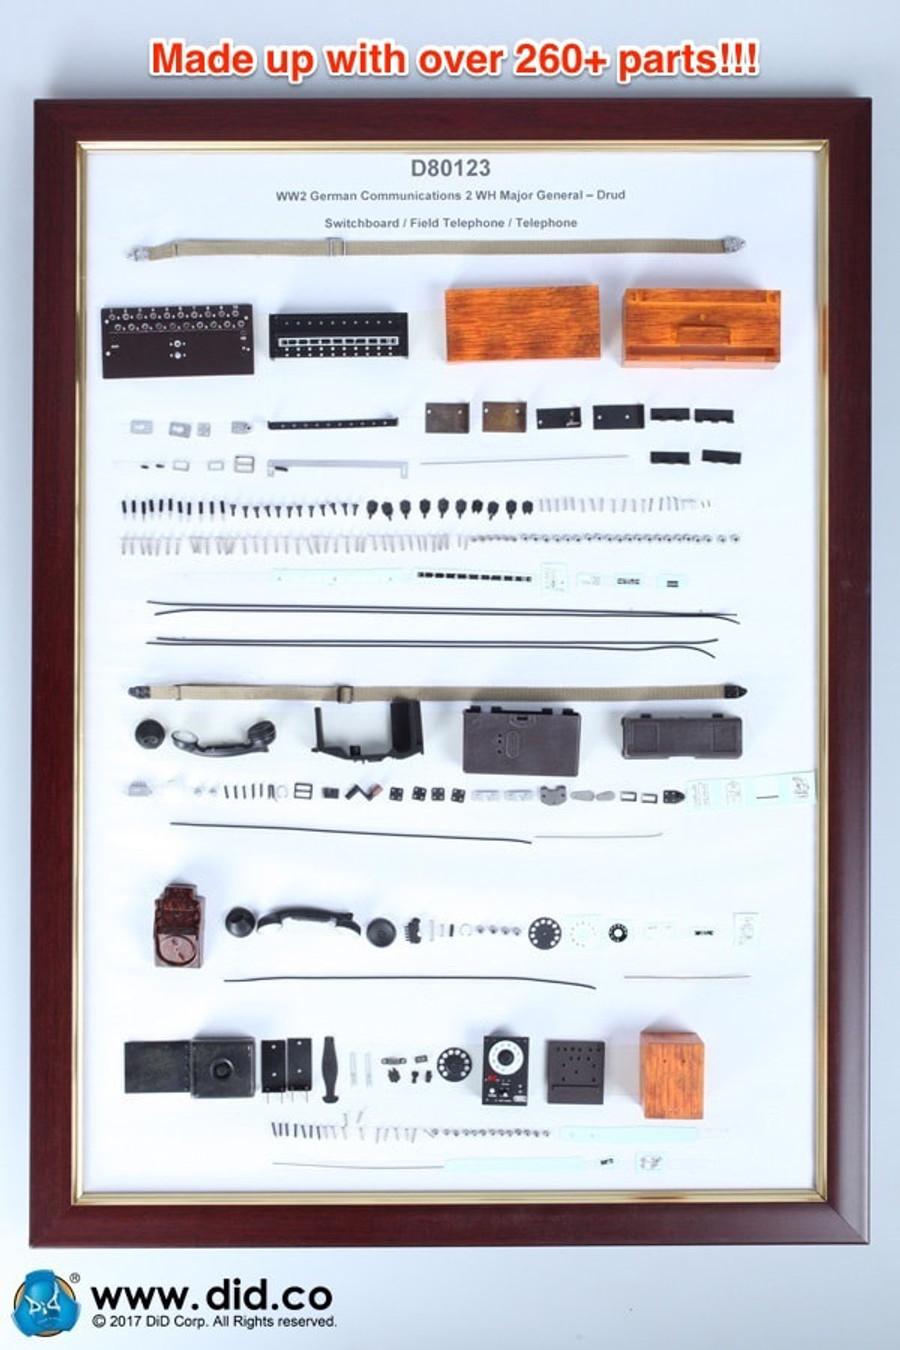 DID - WWII German Communications 2 - Drud